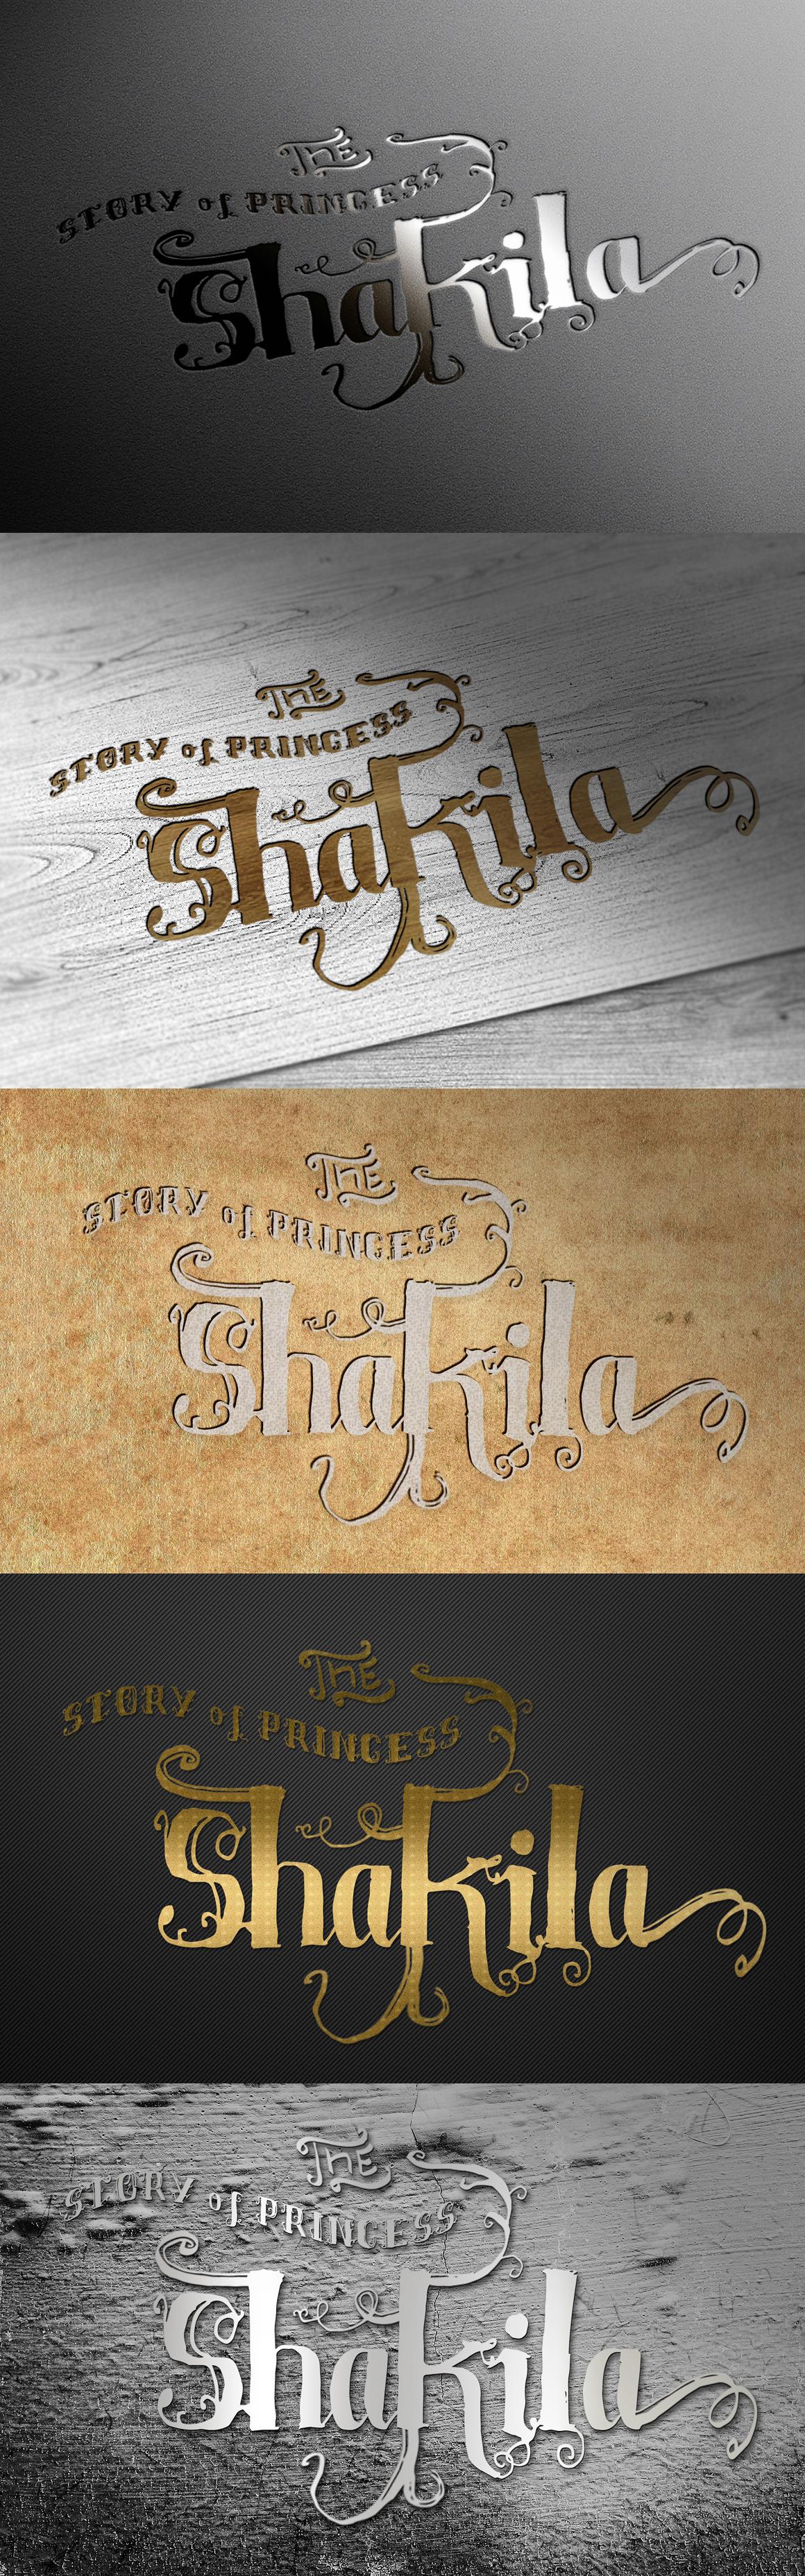 Shakila Typeface Hand Drawn Ornament example image 3